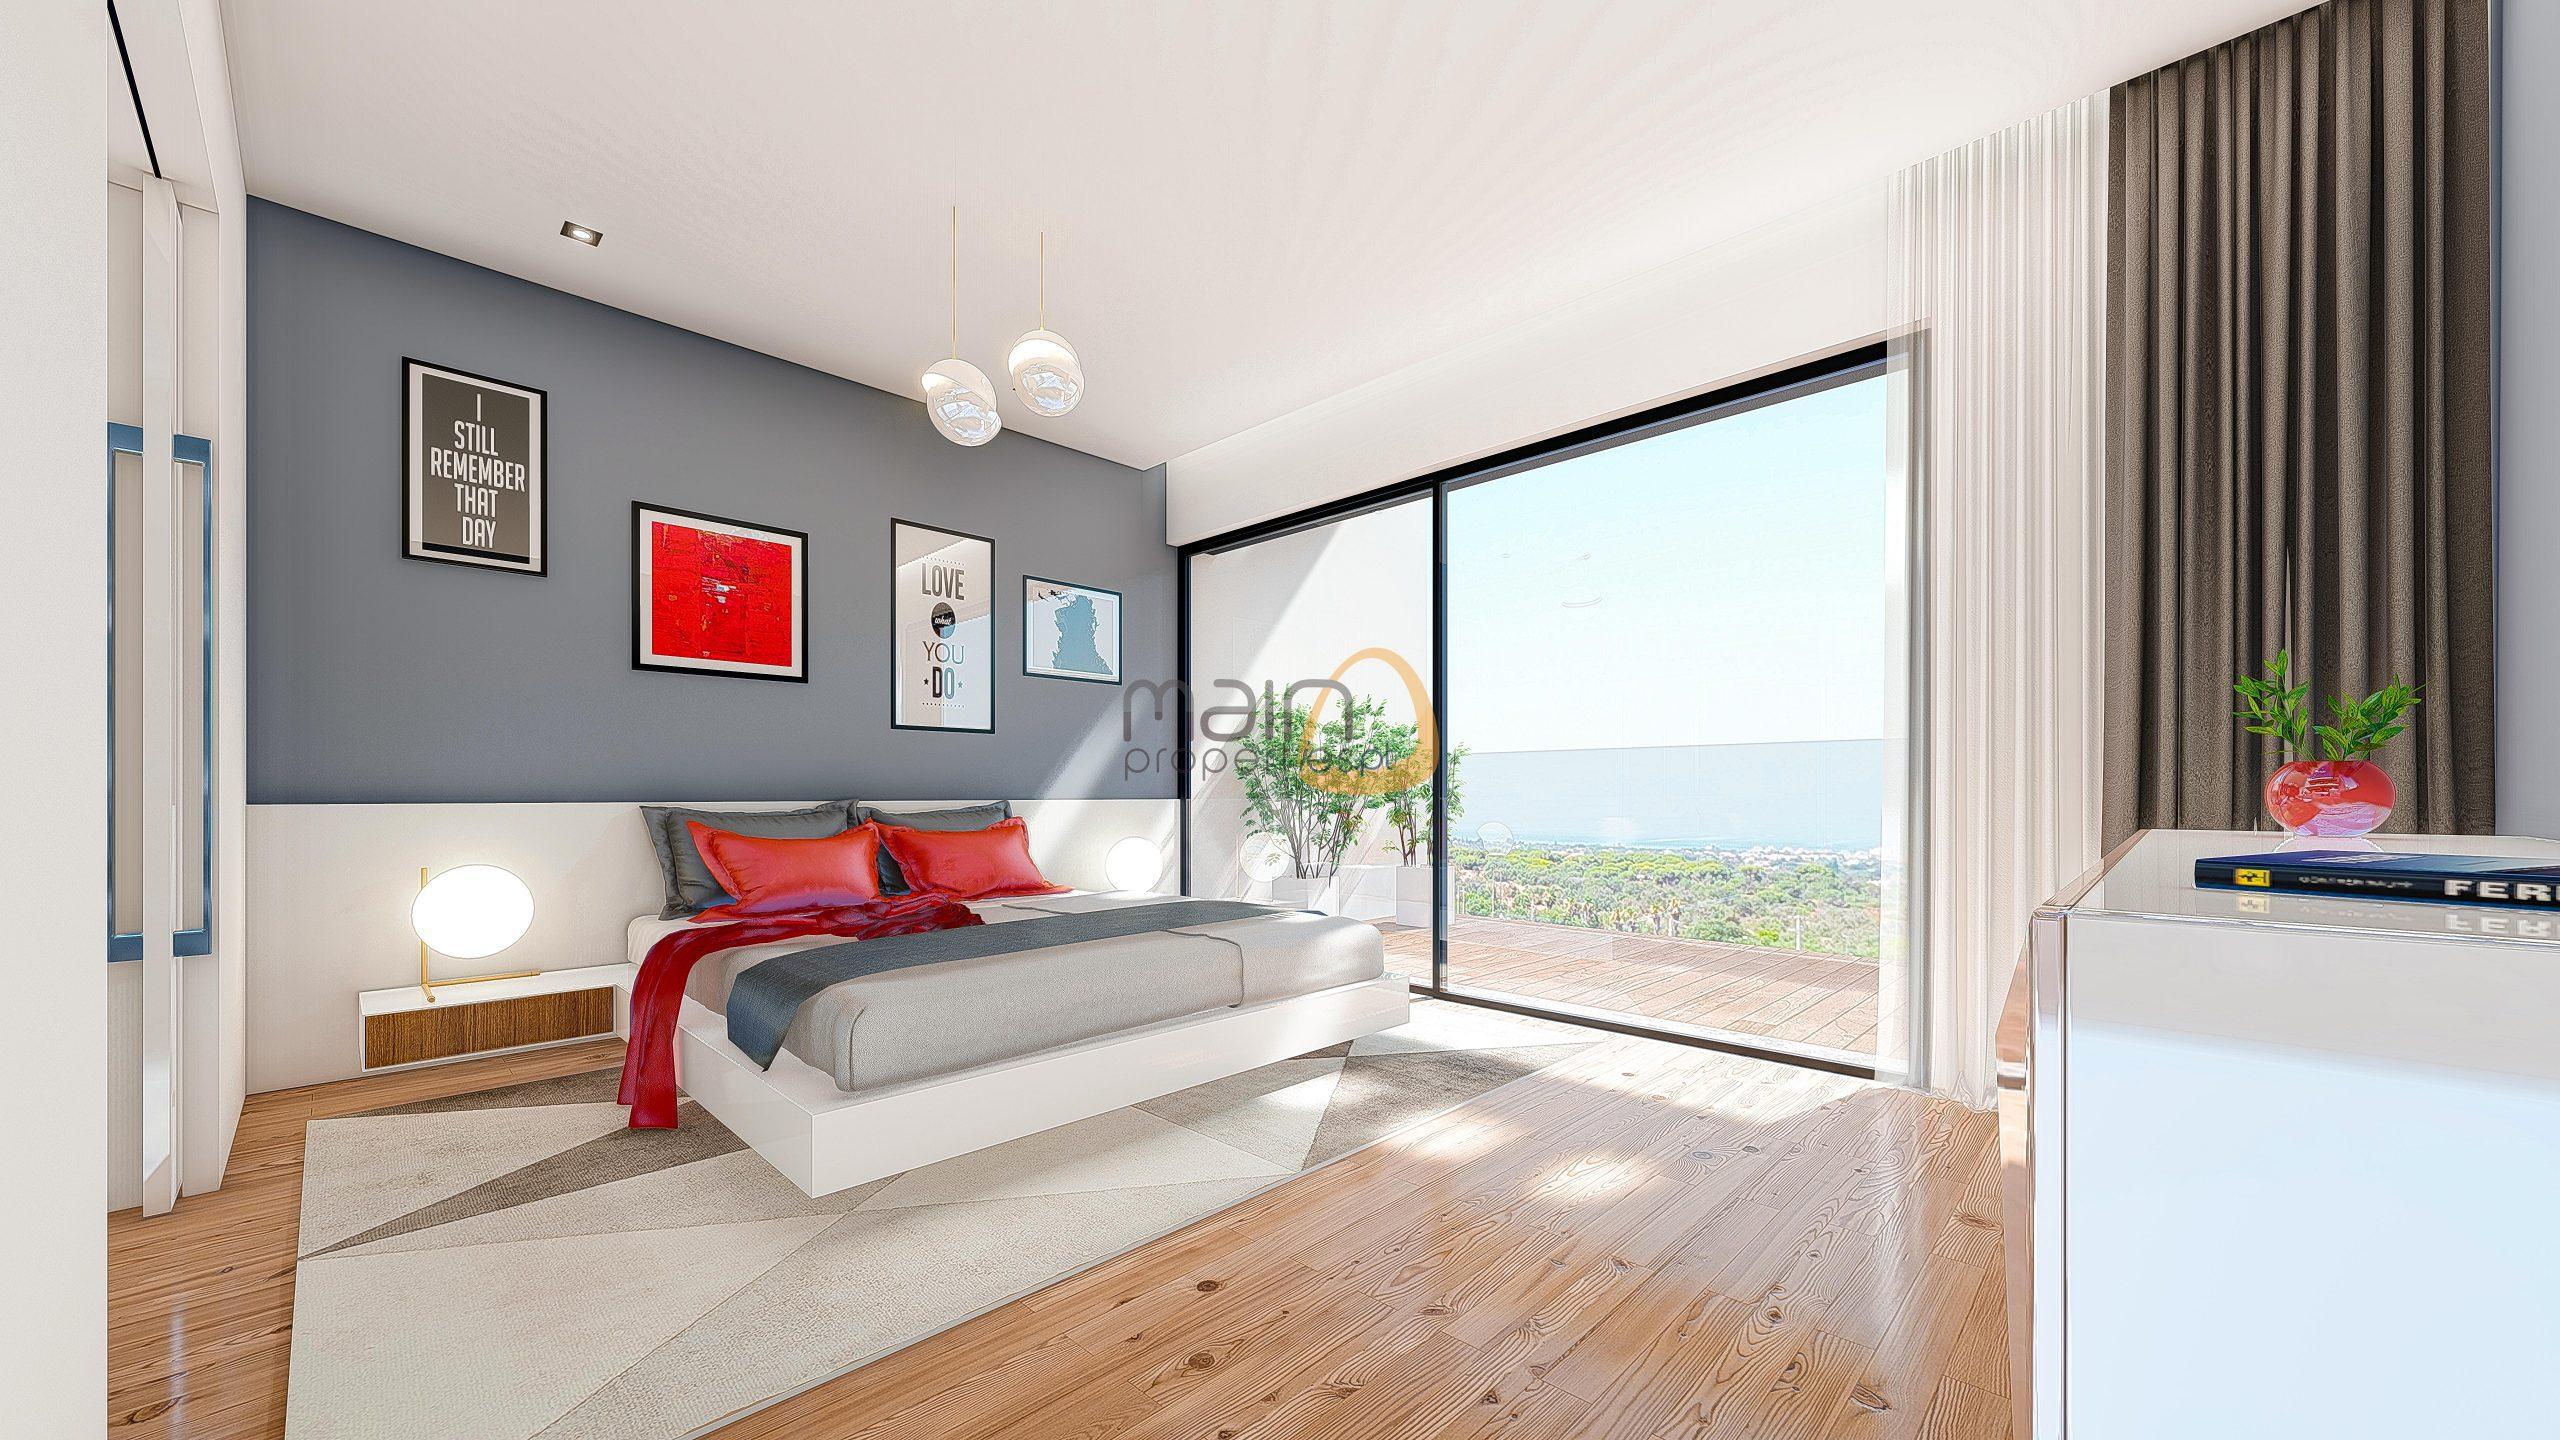 land-for-development-of-eleven-villas-with-sea-views-in-almancil-algarve-portugal-property-real-estate-14